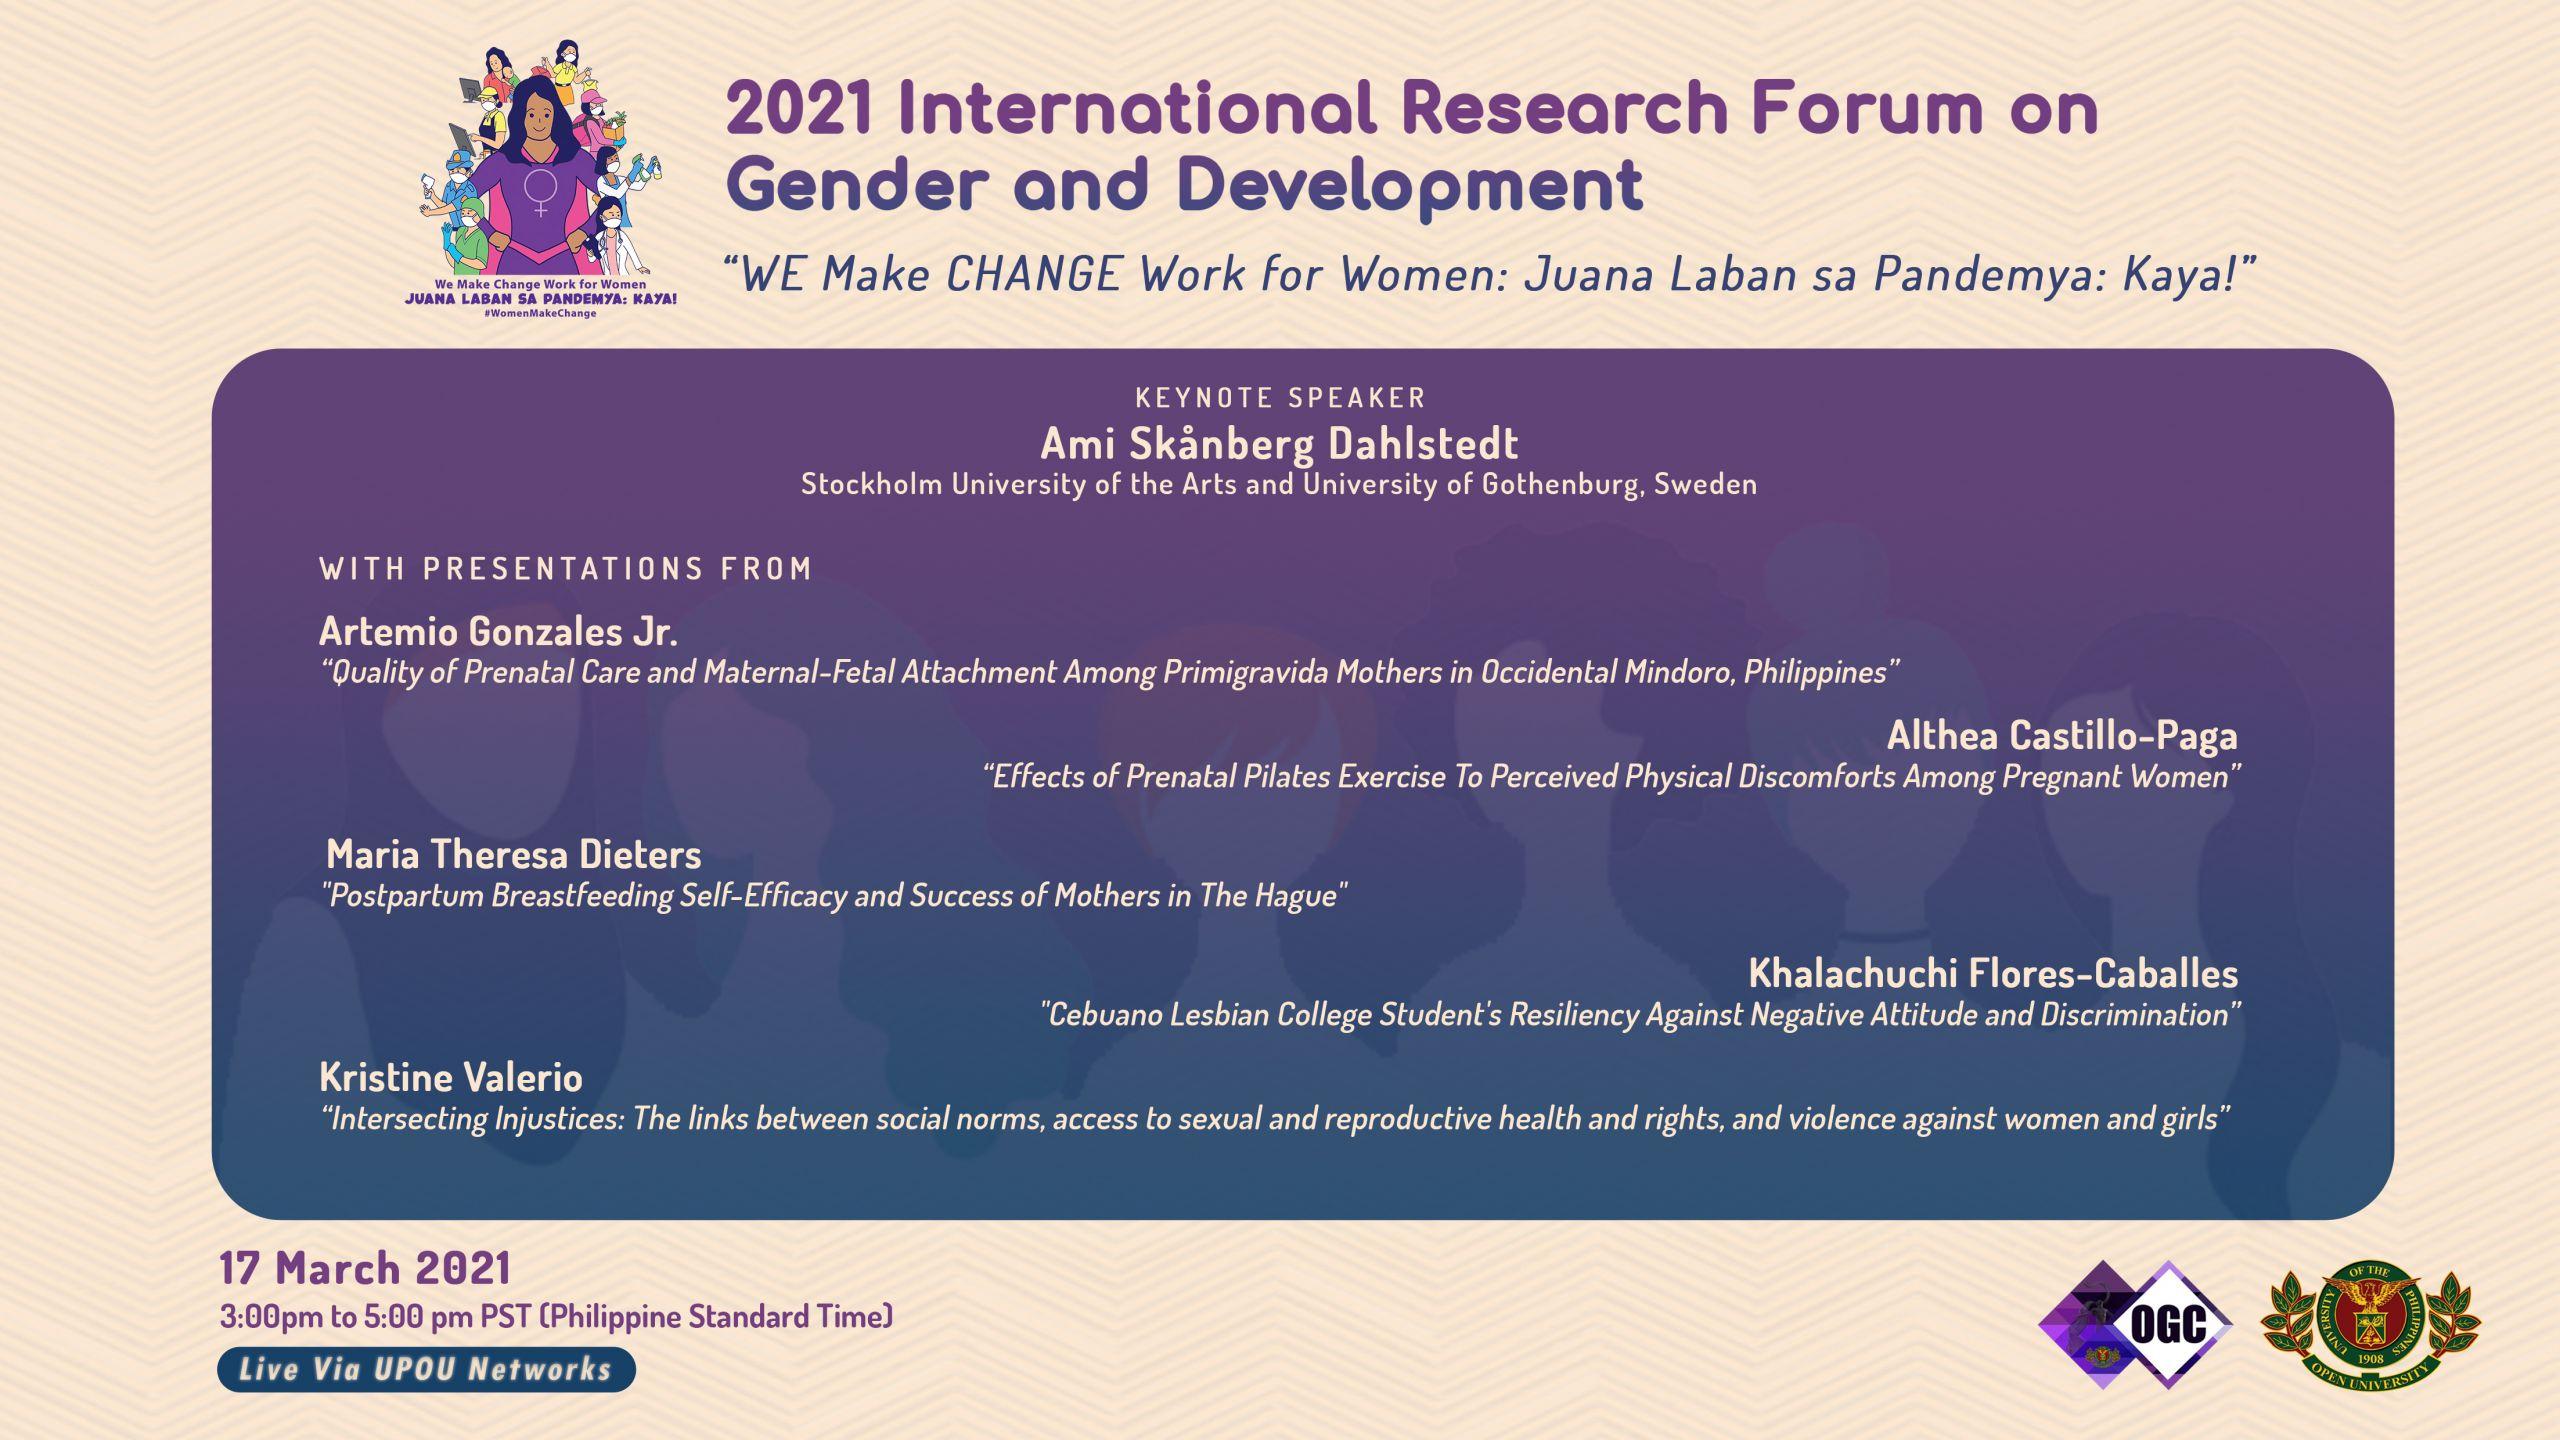 International Research Forum on Gender and Development